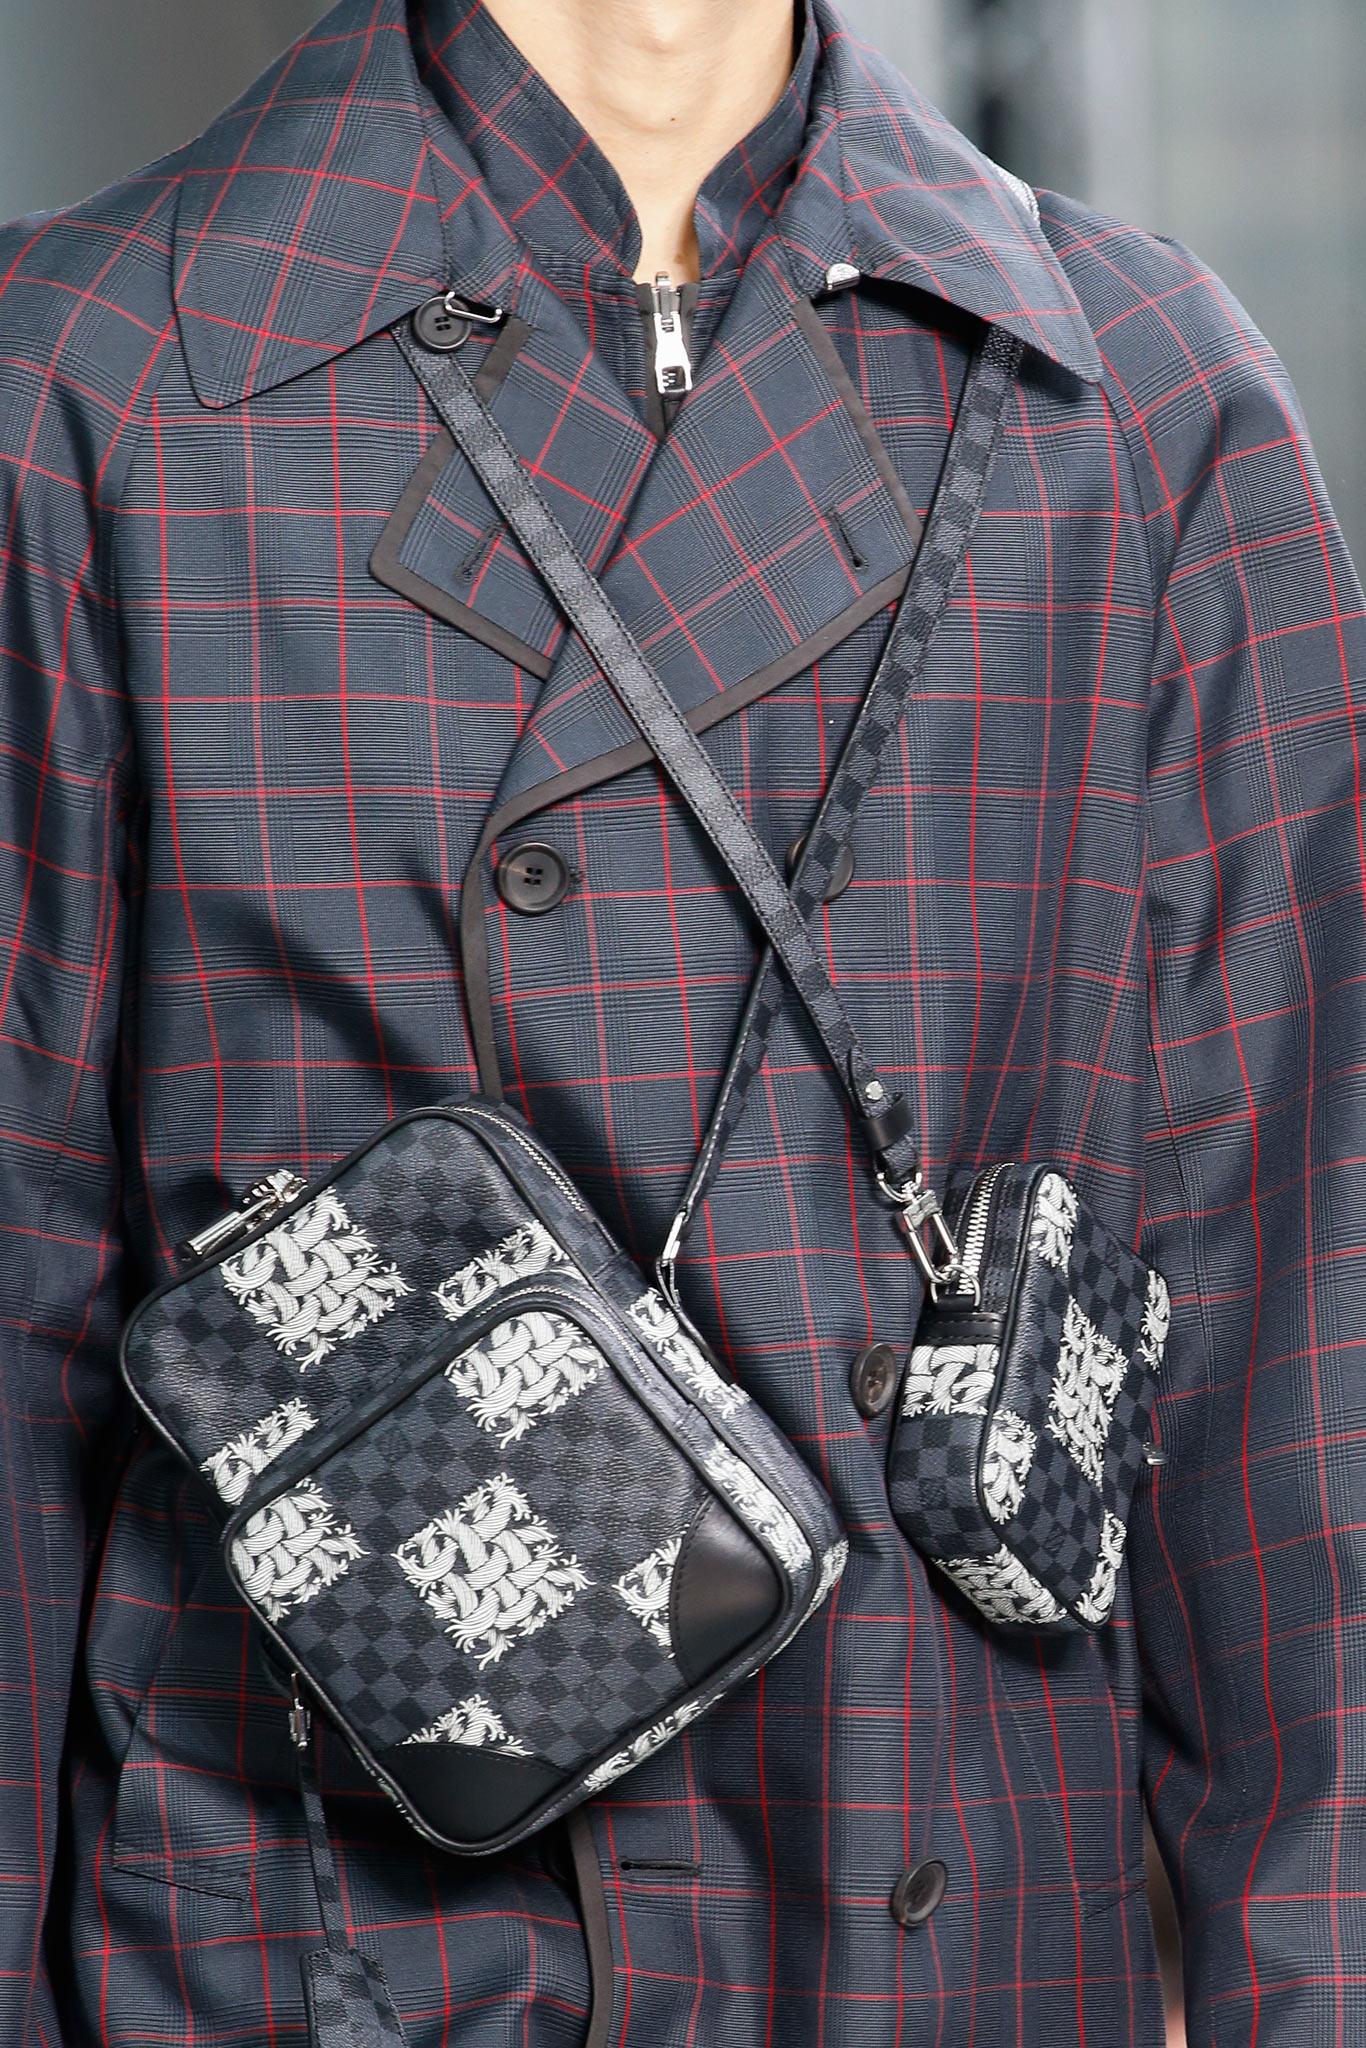 louis vuitton men u0026 39 s fall    winter 2015 runway bags featuring damier graphite nemeth print